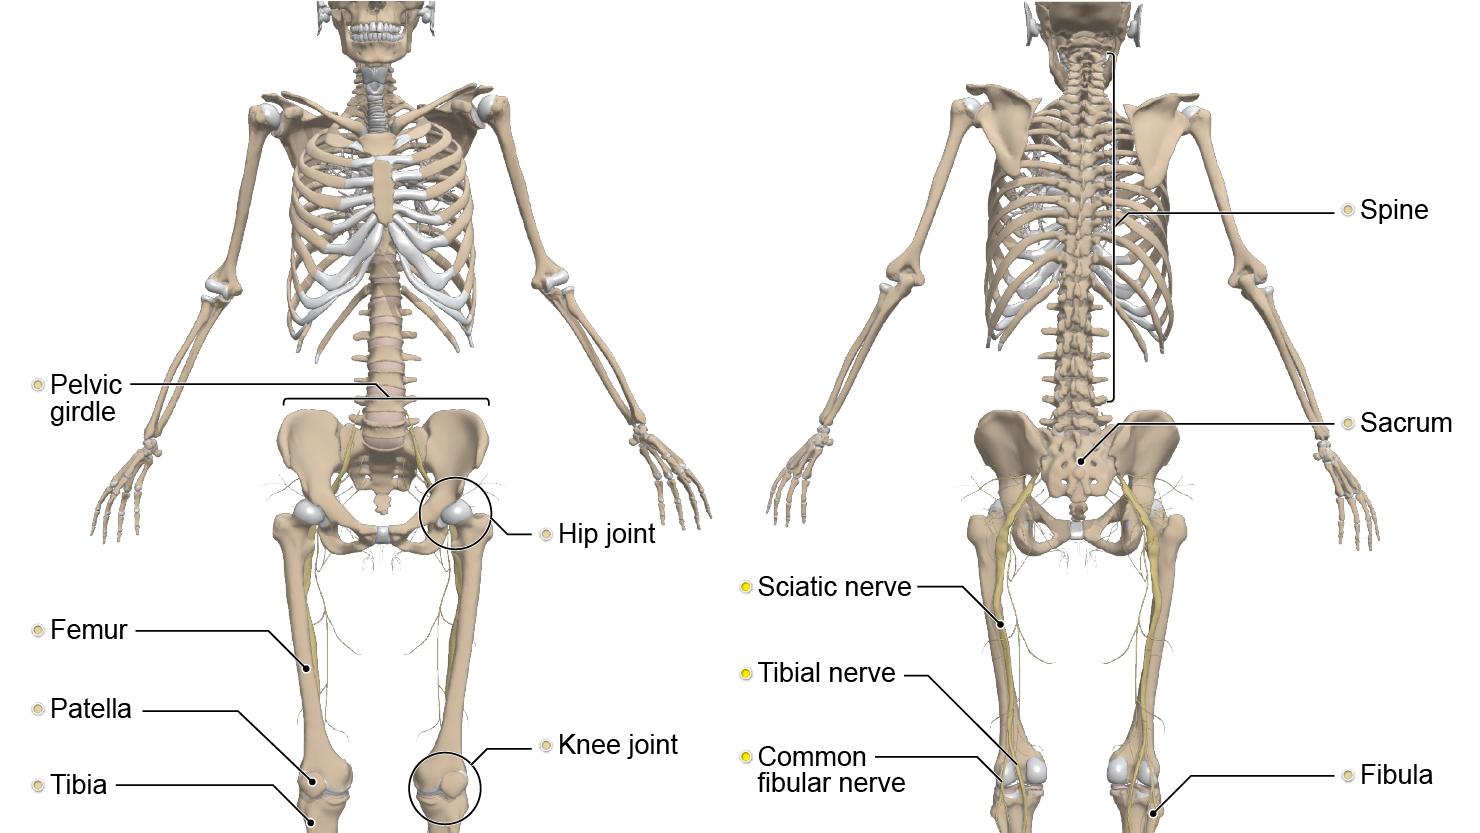 anterior - posterior - body - anatomy - cross-legged - legs - crossed - Primal Pictures